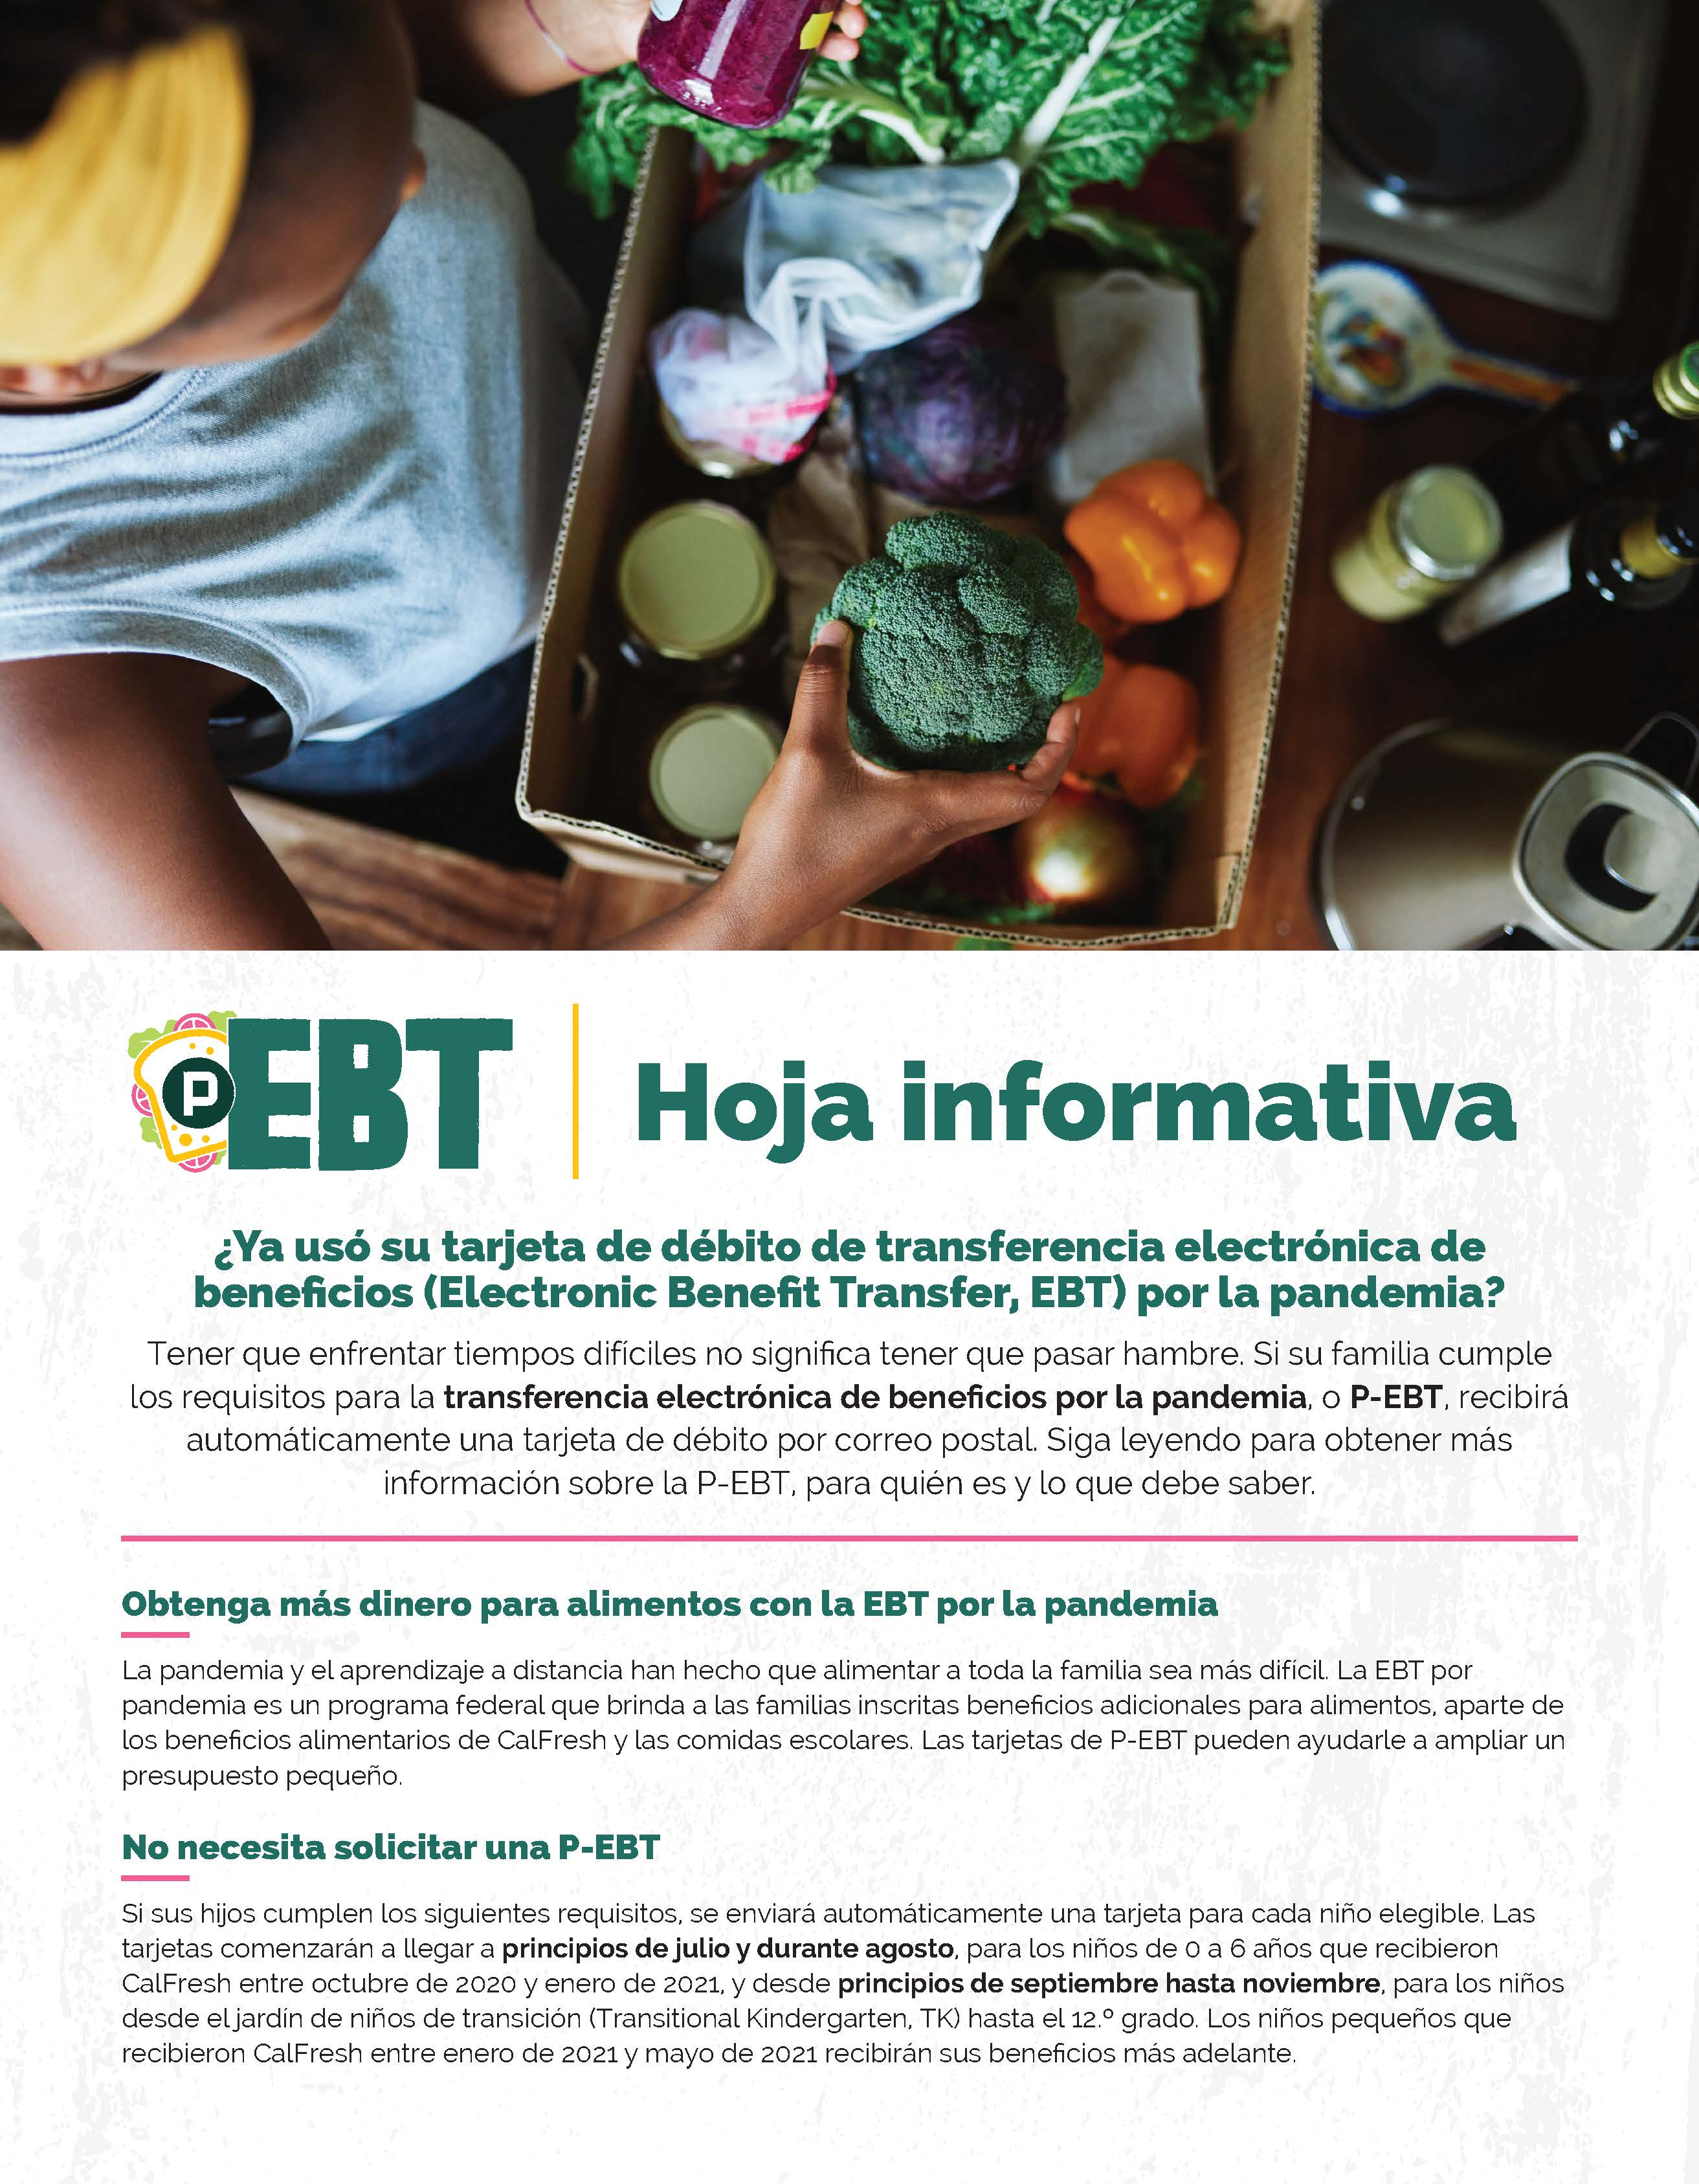 Images/PEBT-P1-03-1_Spanish_Page_1.jpg